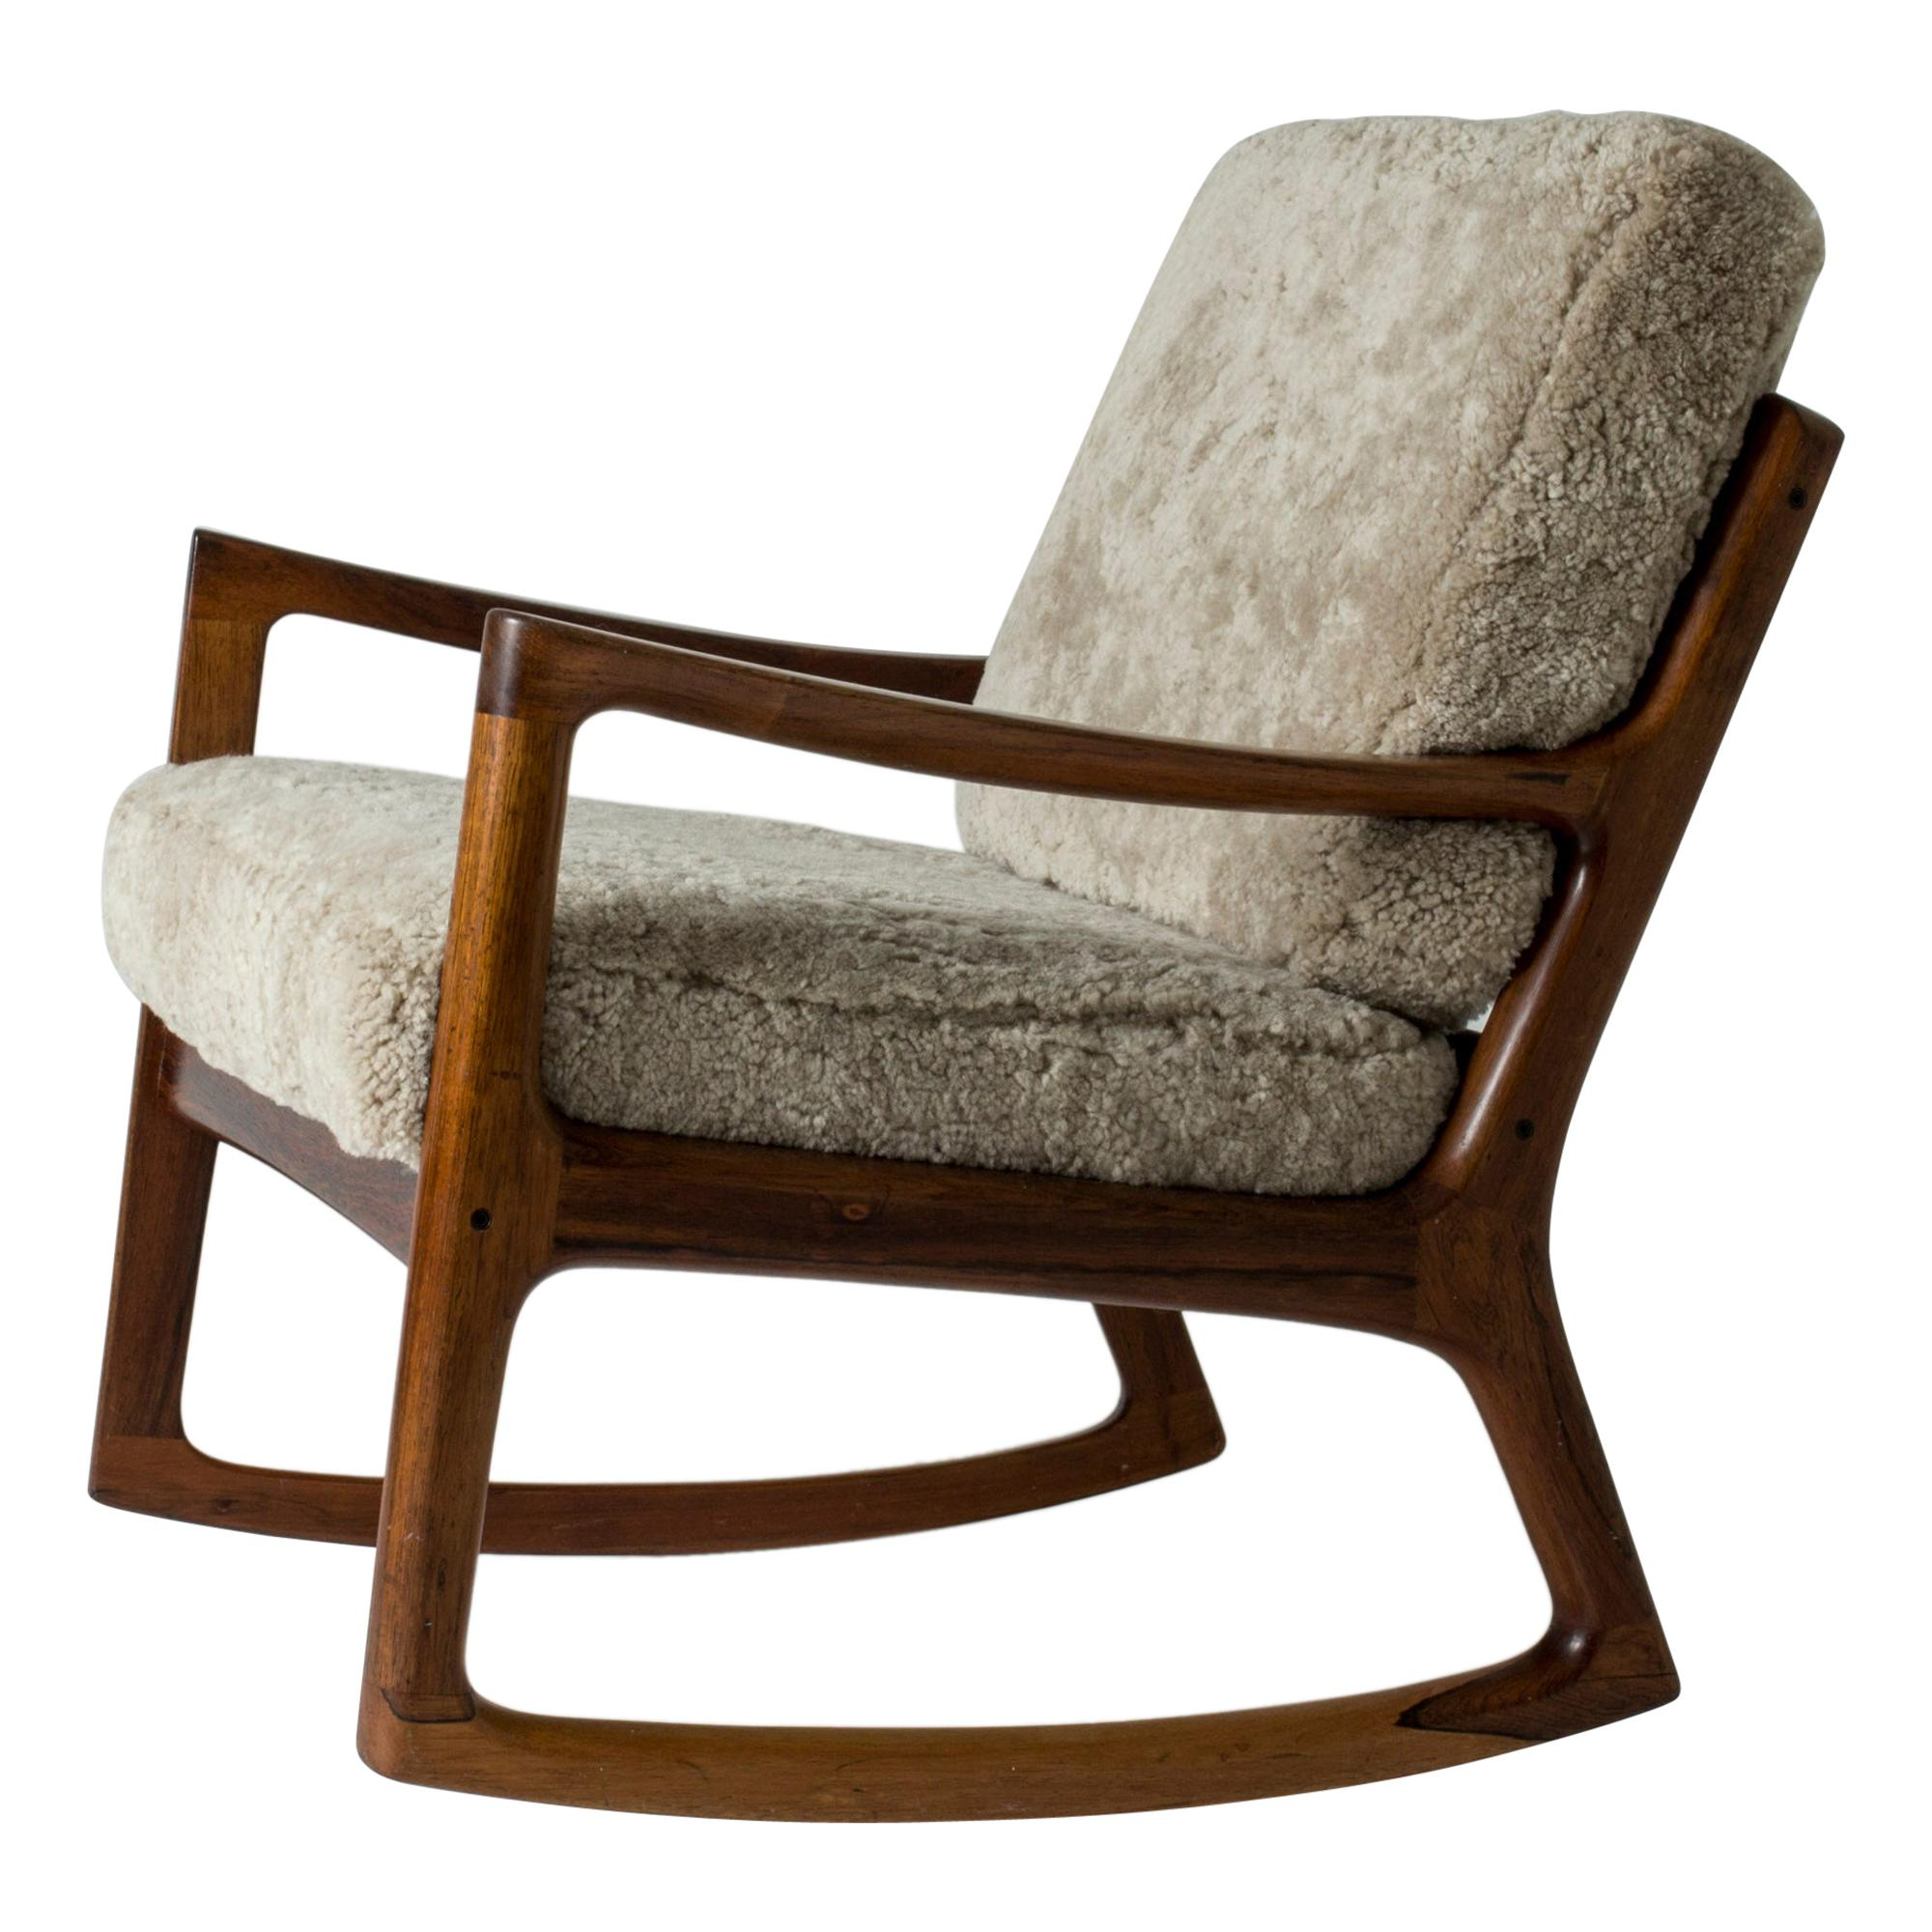 """Senator"" Rocking Chair by Ole Wanscher for France & Son, Denmark, 1960s"